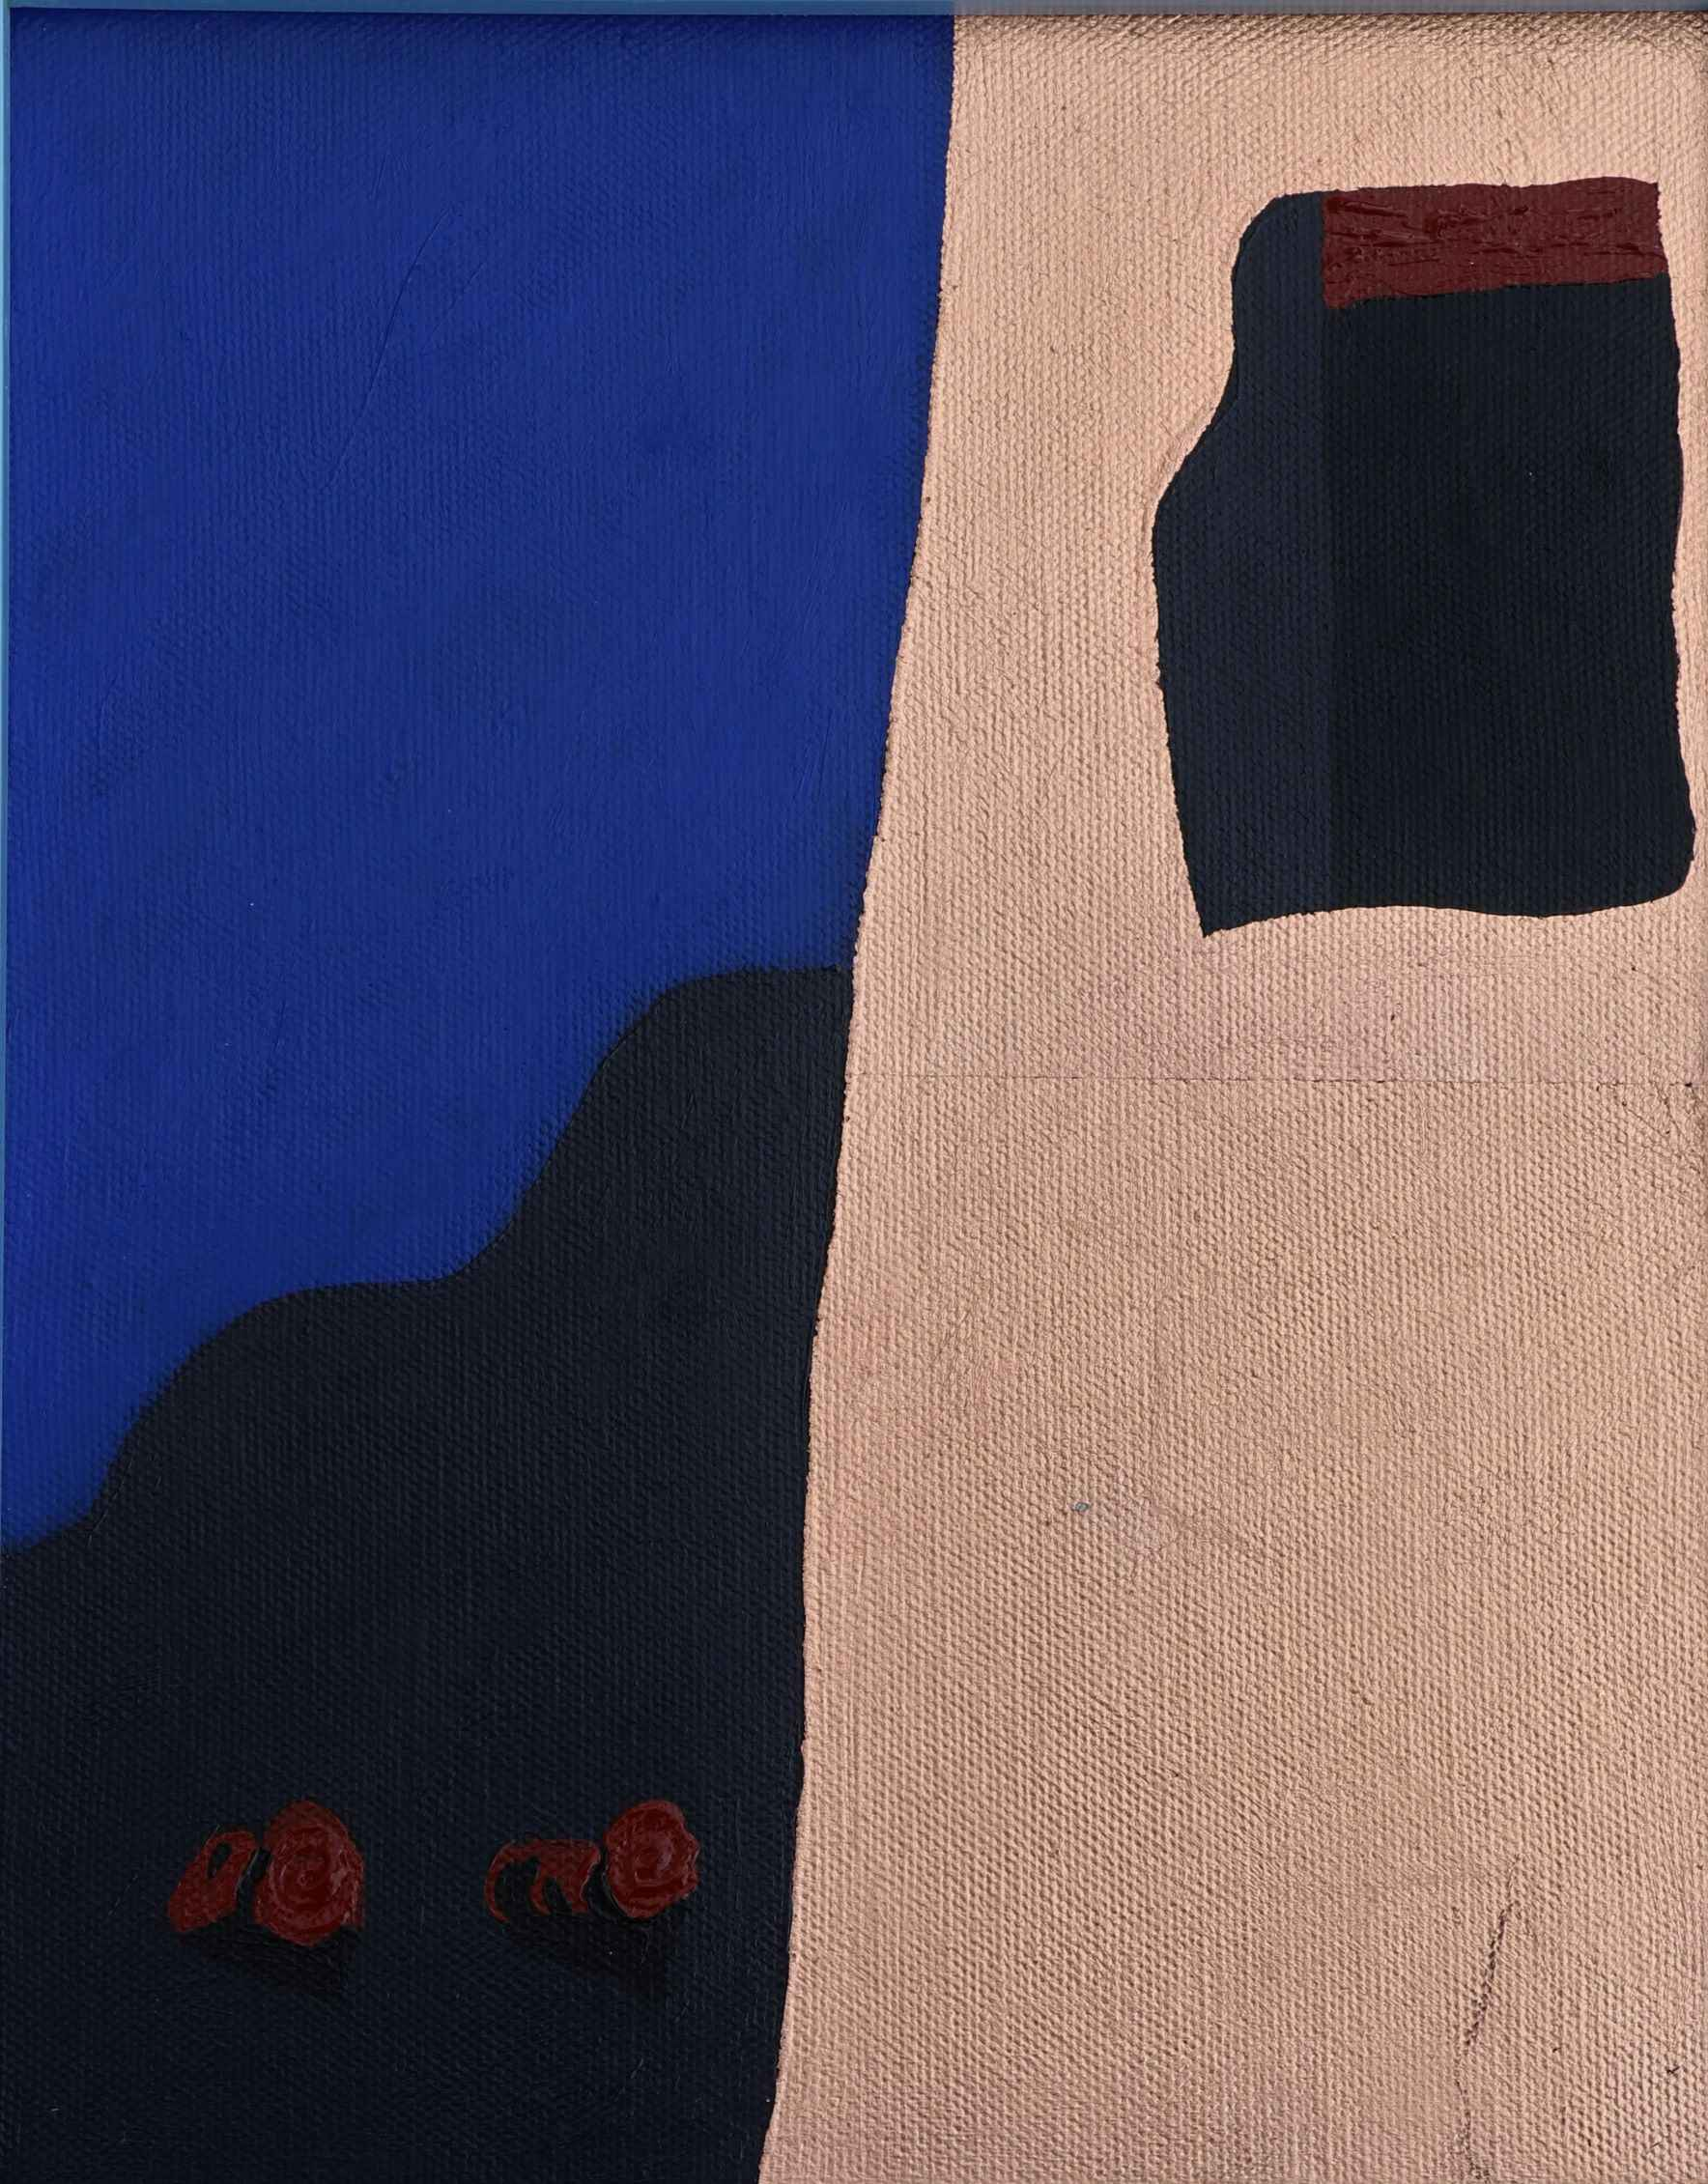 Meem's Window (Copper) by  Alvin Gill-Tapia - Masterpiece Online